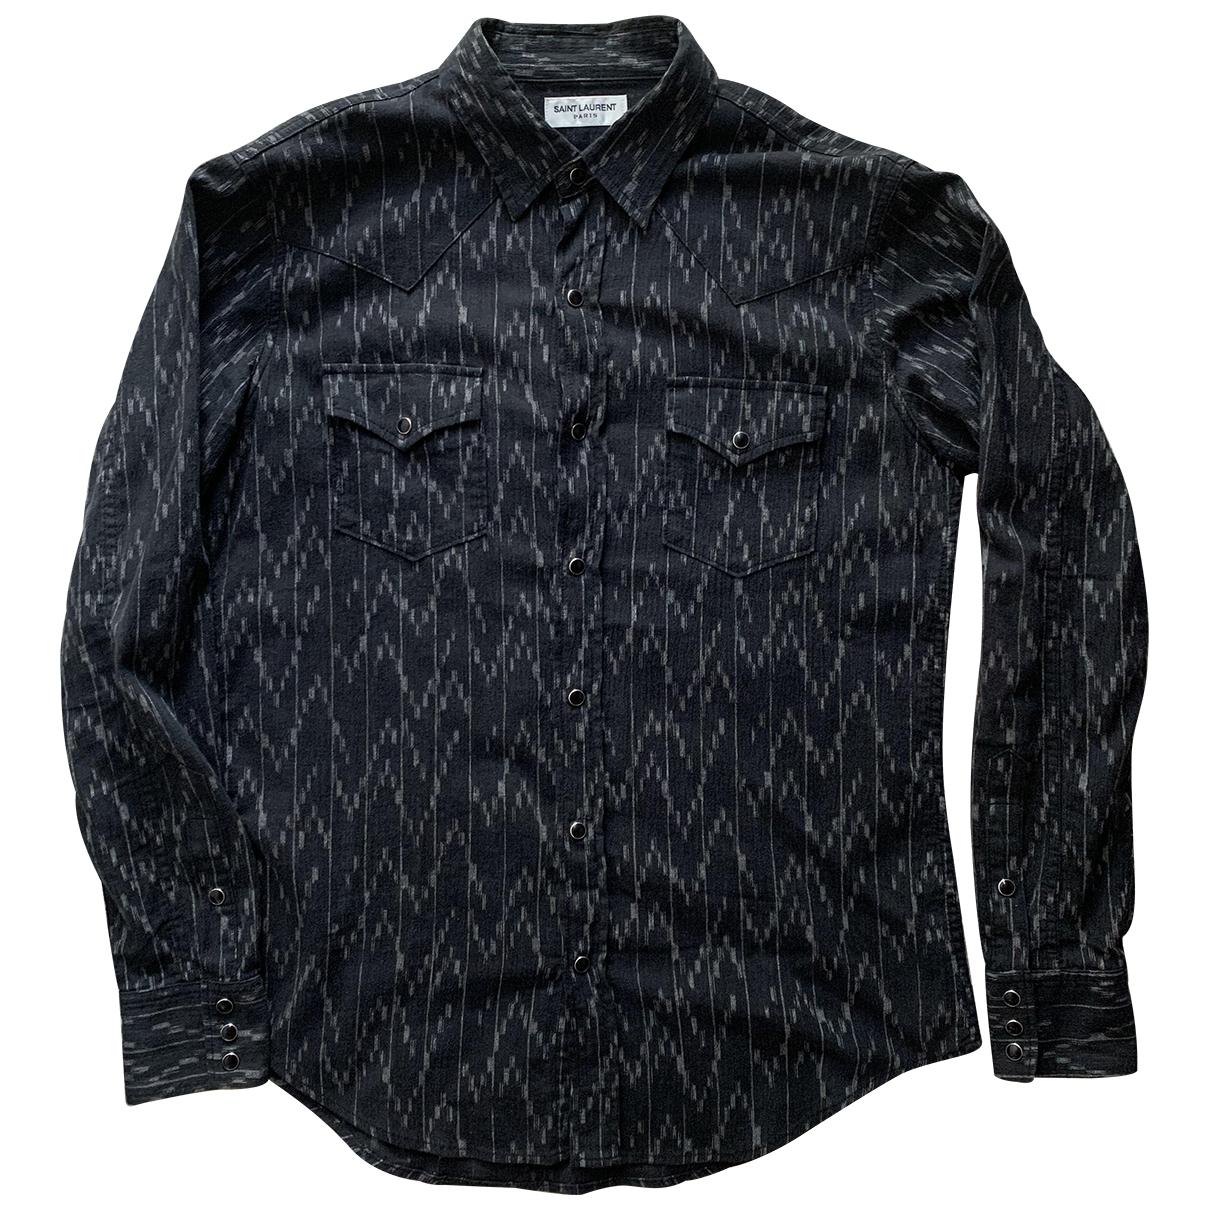 Saint Laurent \N Anthracite Cotton Shirts for Men M International